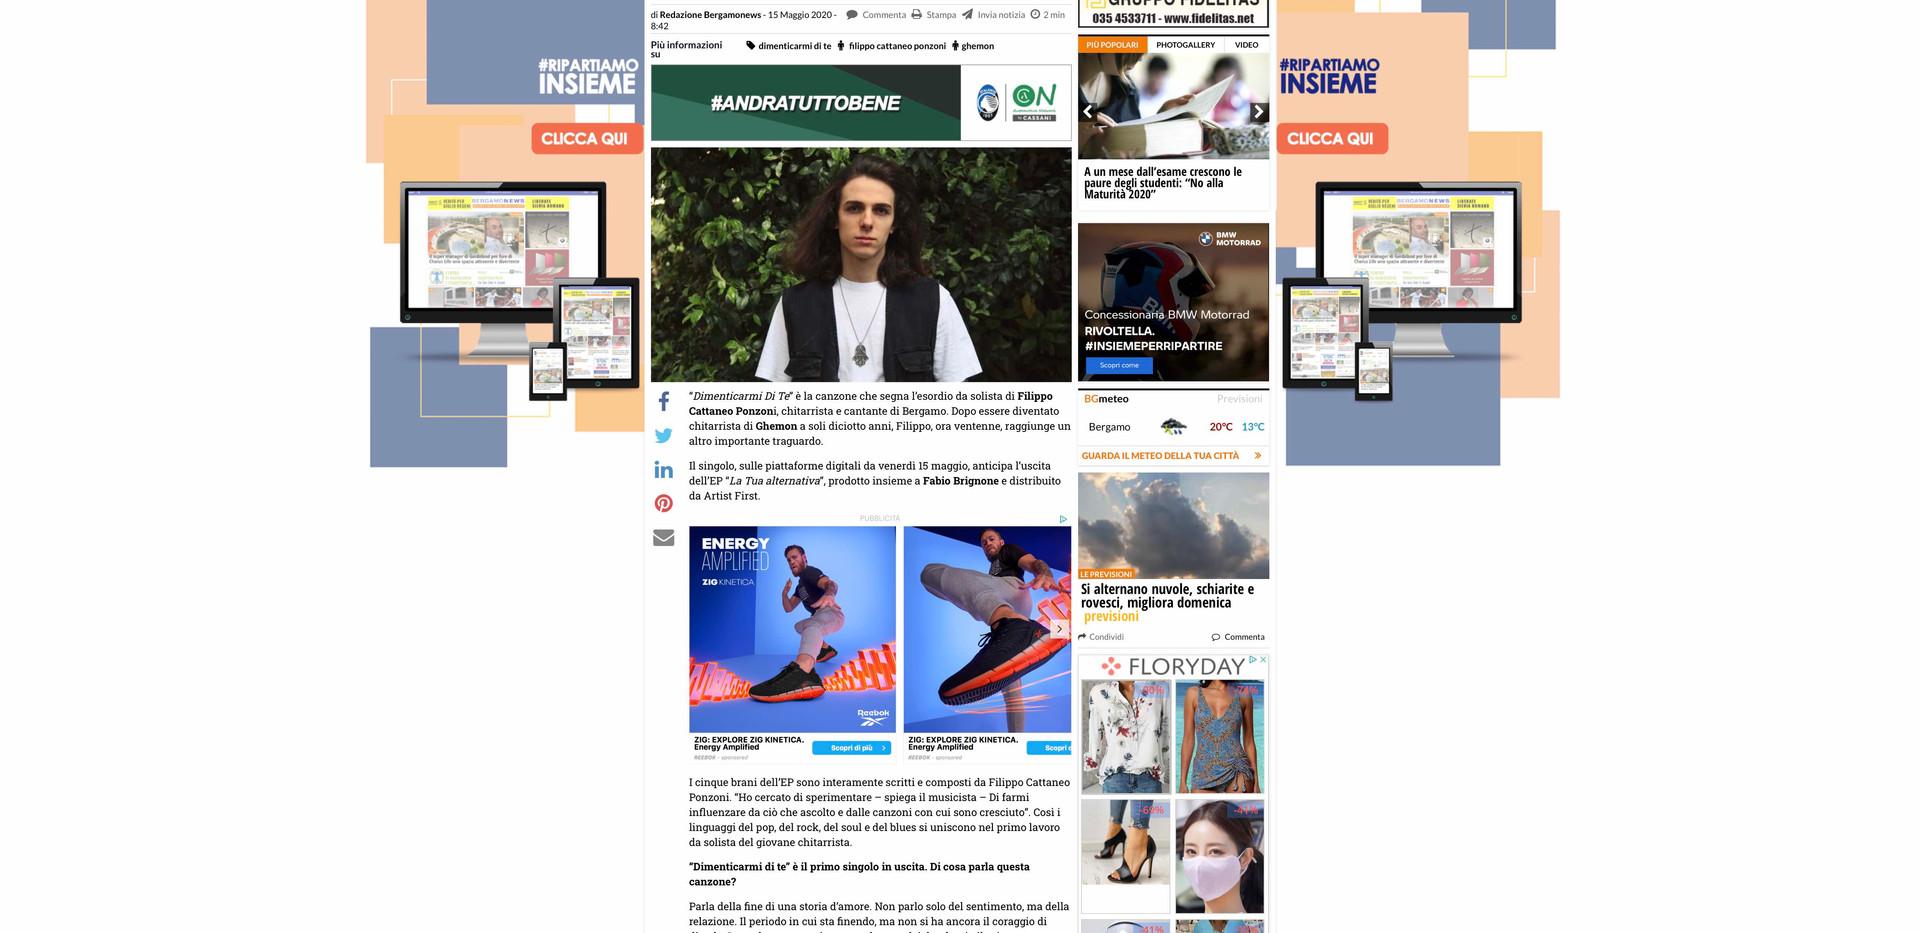 Articolo Bergamonews 1.jpg